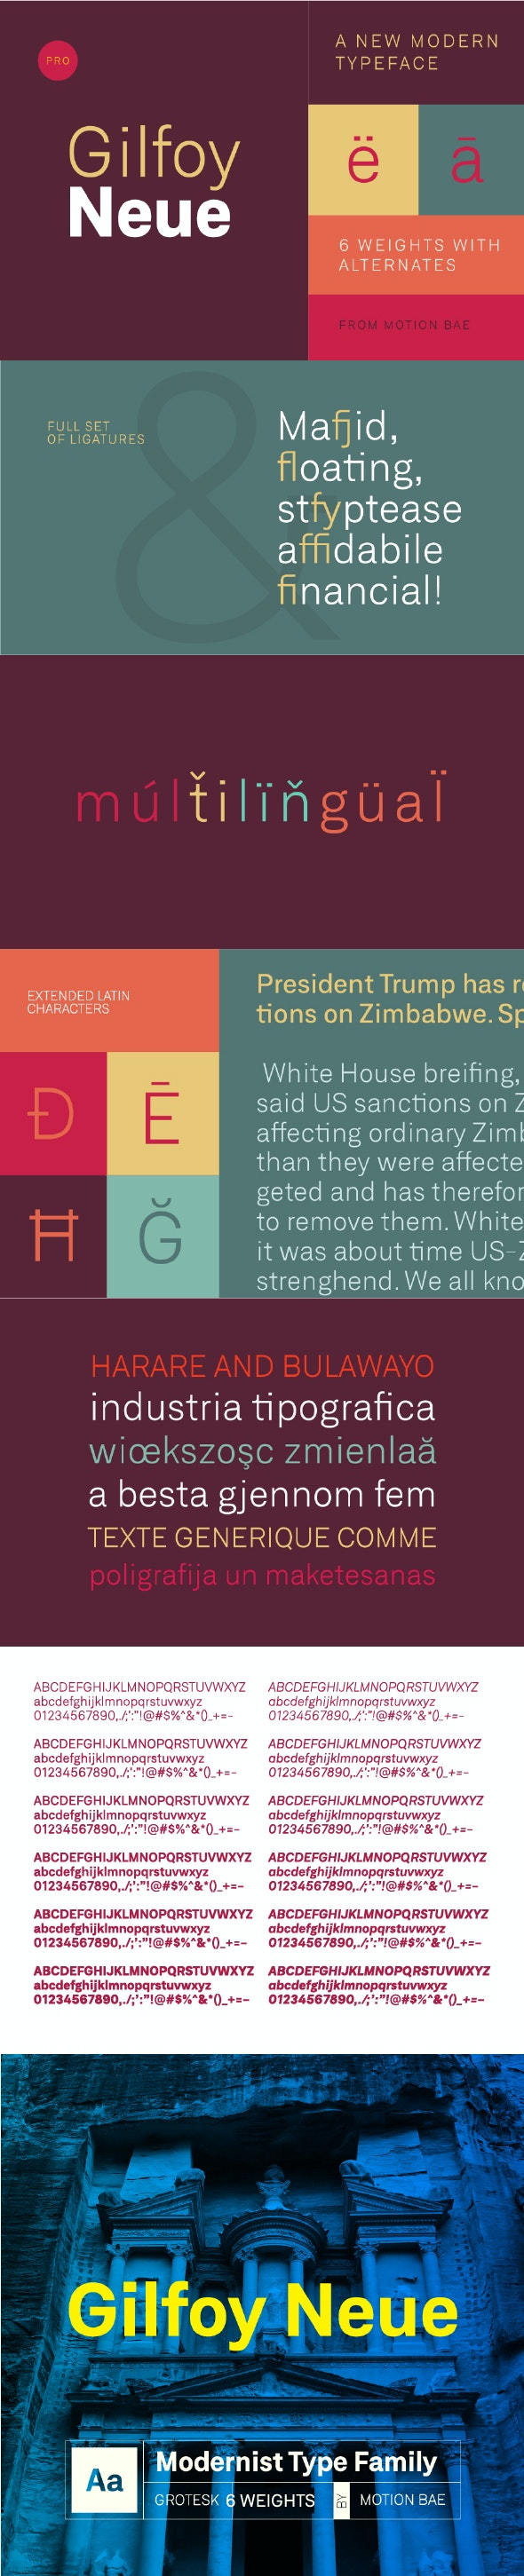 Gilfoy Neue Pro Font (6 Weights) - Miscellaneous Sans-Serif